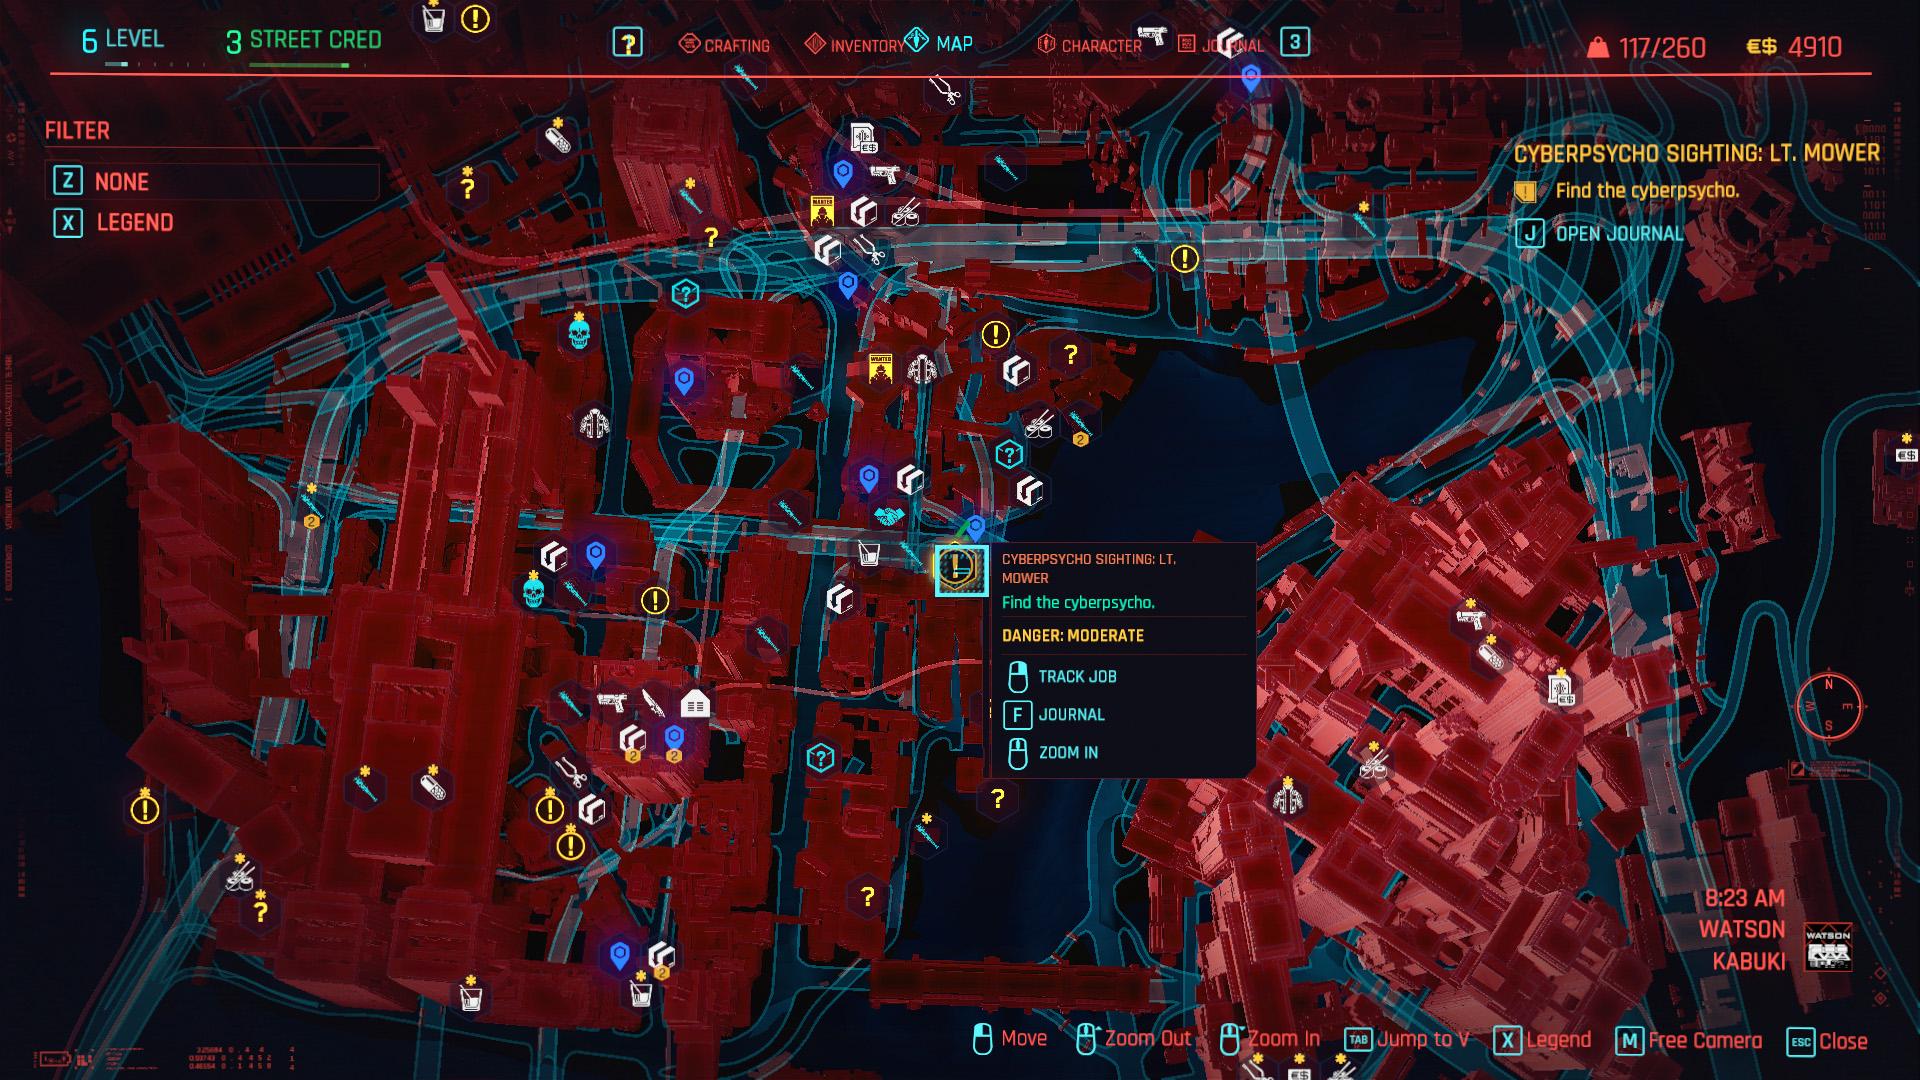 Cyberpunk 2077 Lt Mower Cyberpsycho Sightings locations